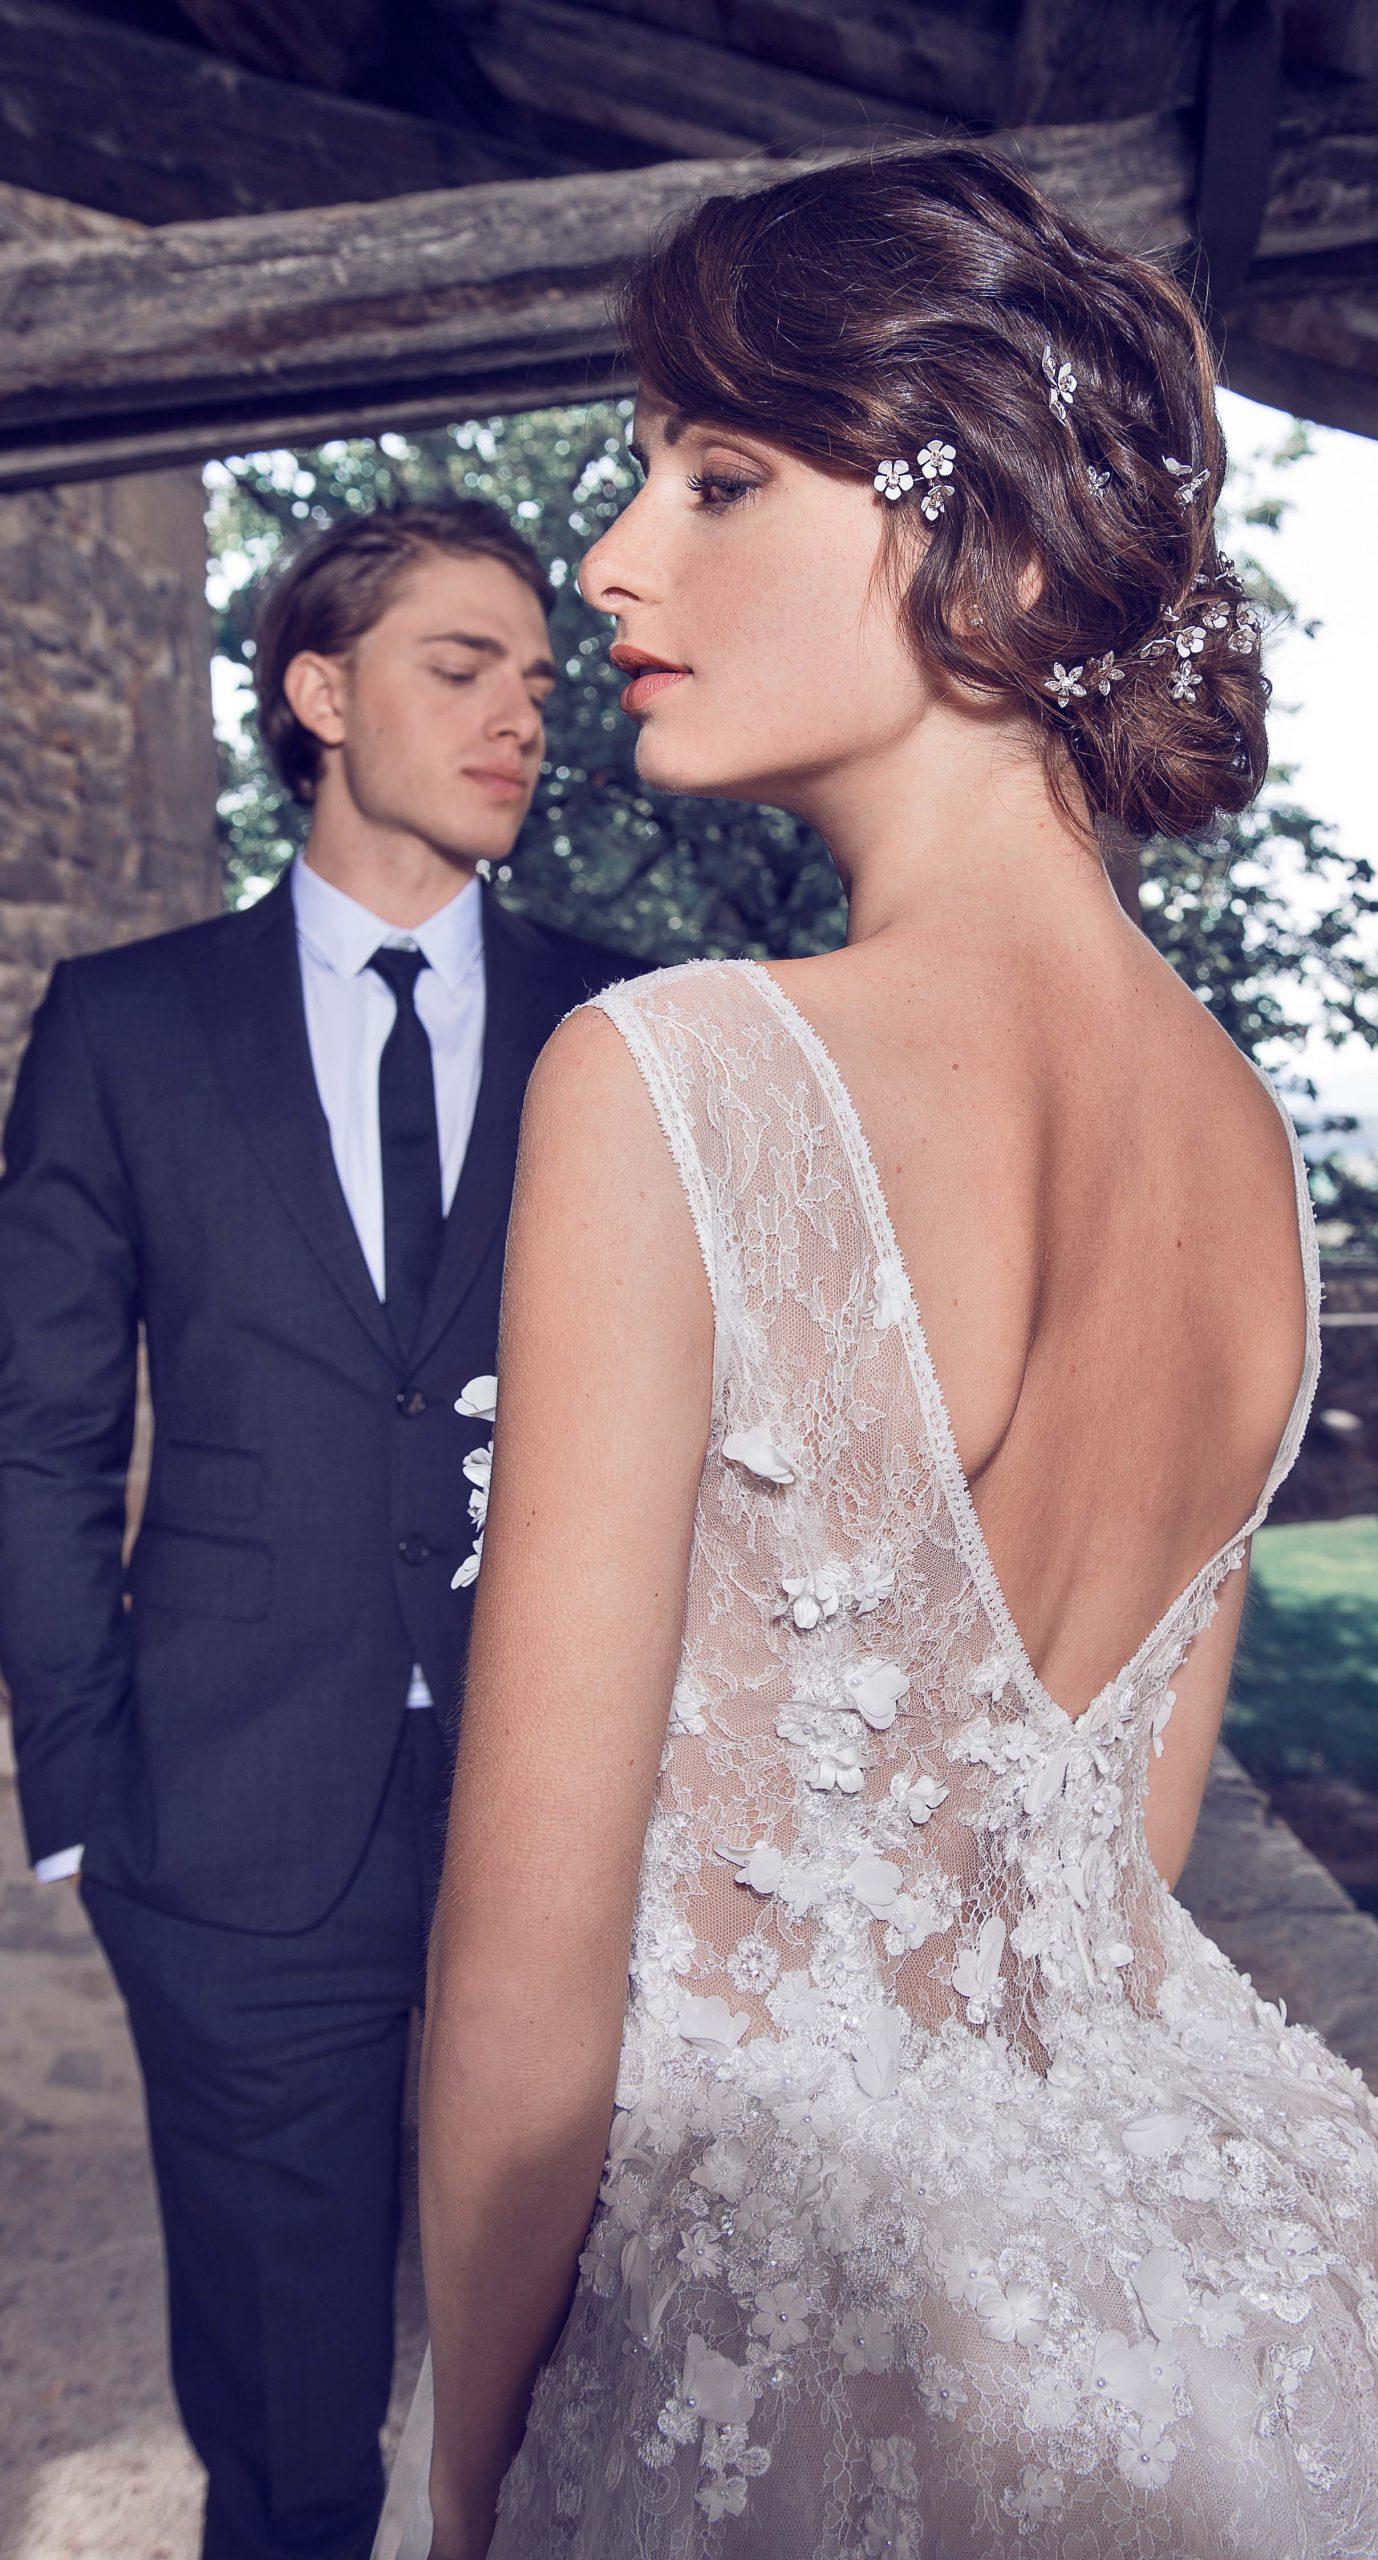 seance photo-mariage-robe mariée-créateur-nicolas fafiotte-maquillage-dmkf-5